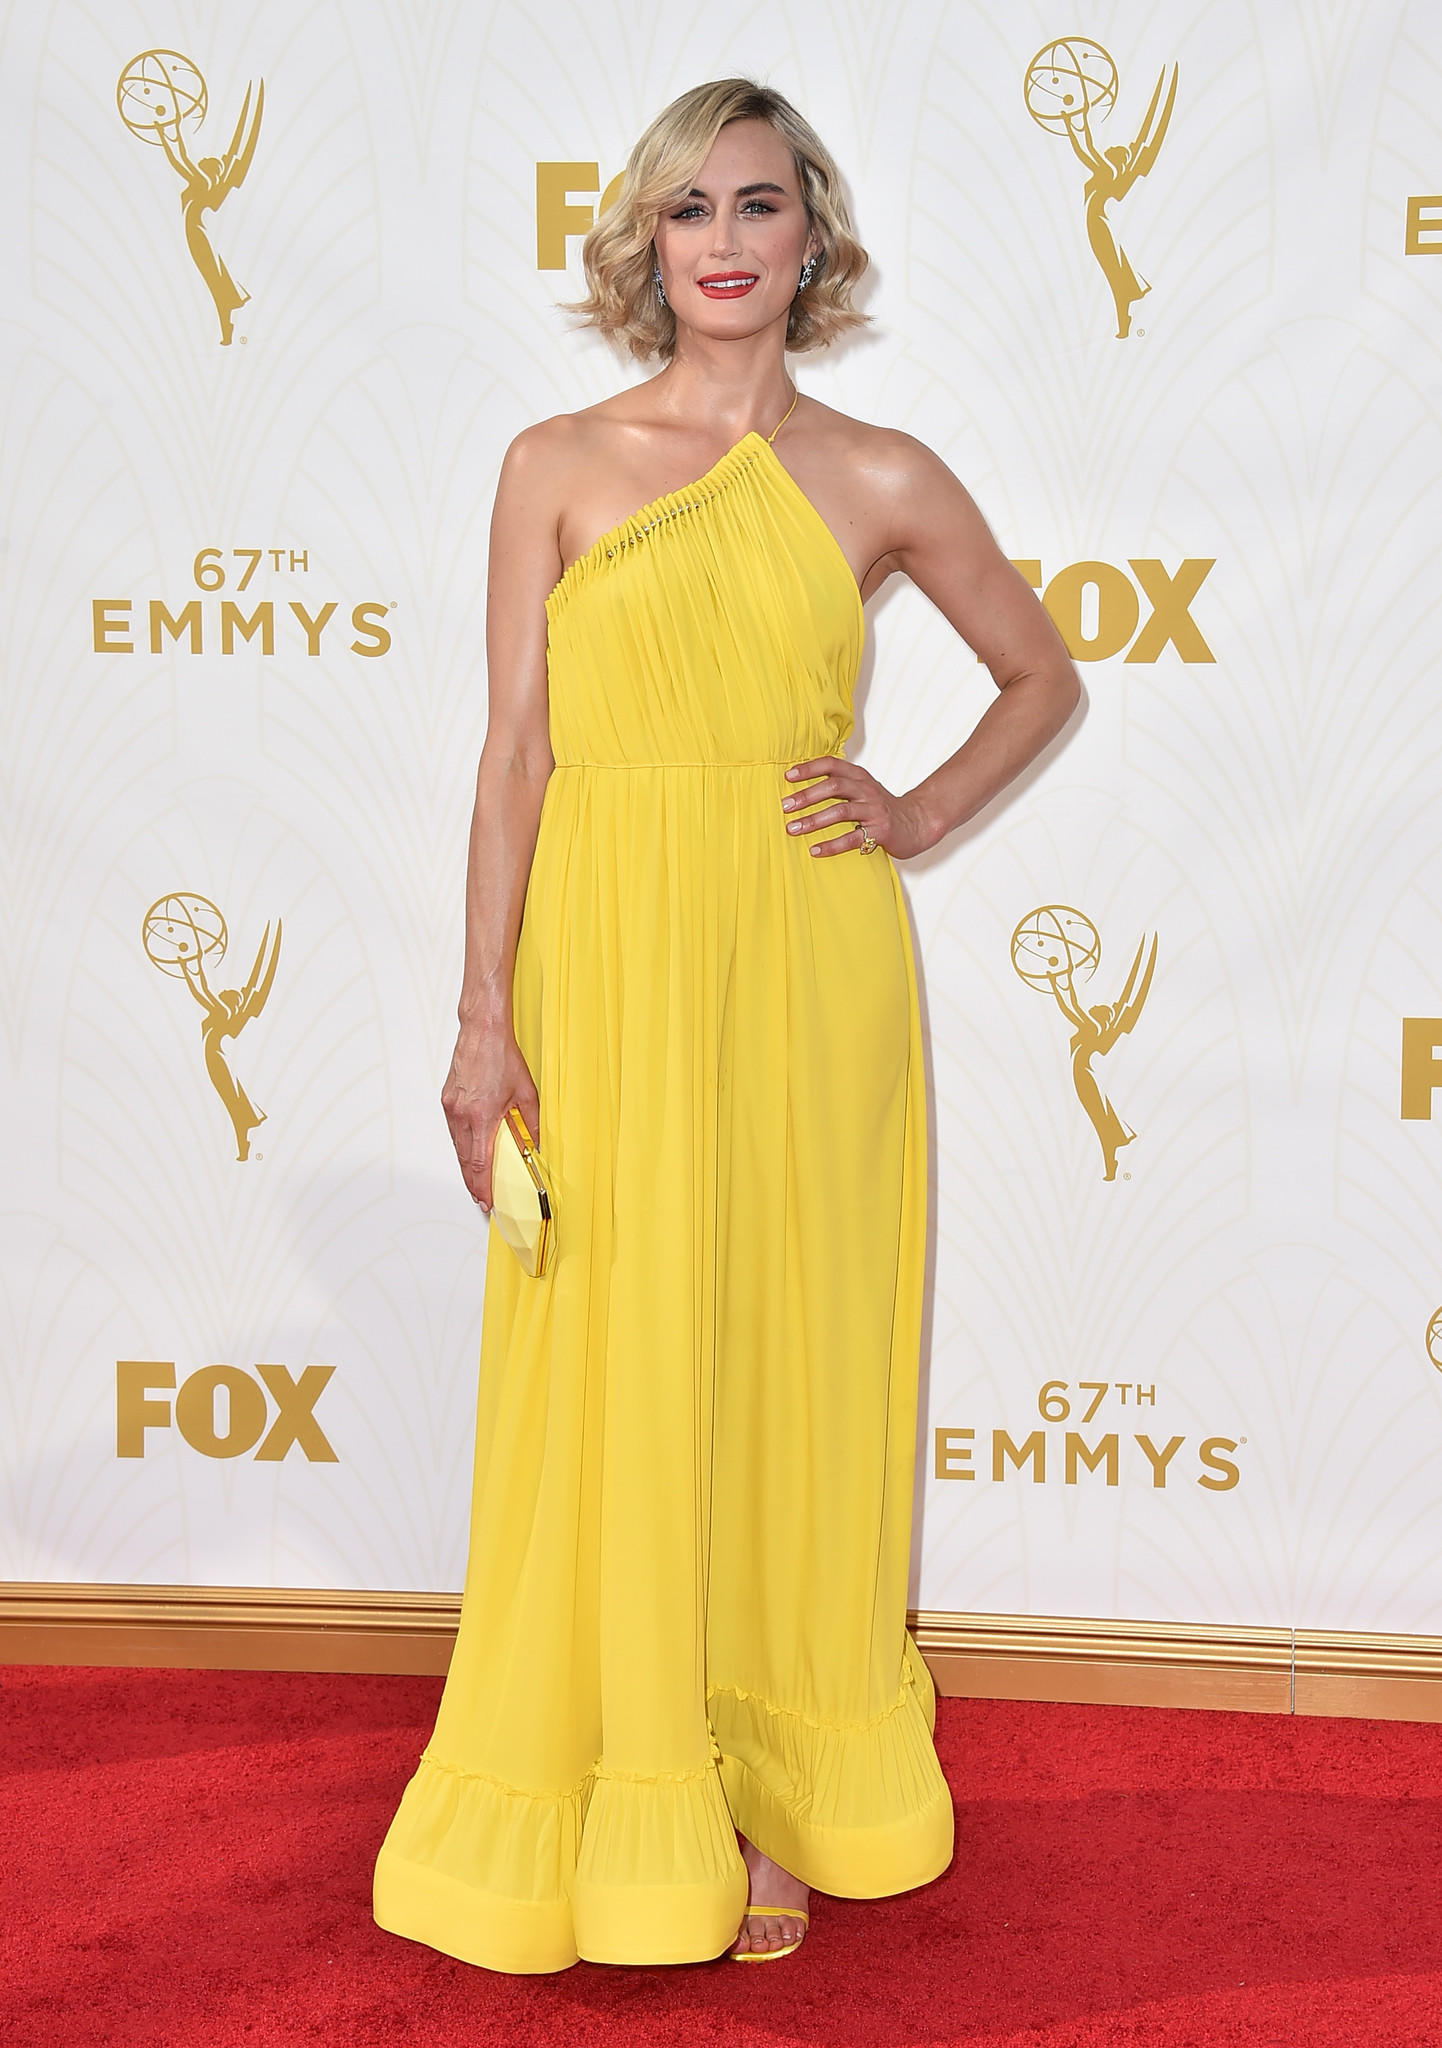 Taylor Schilling arrives at the 67th Primetime Emmy Awards (Jordan Strauss / Jordan Strauss/Invision/AP)